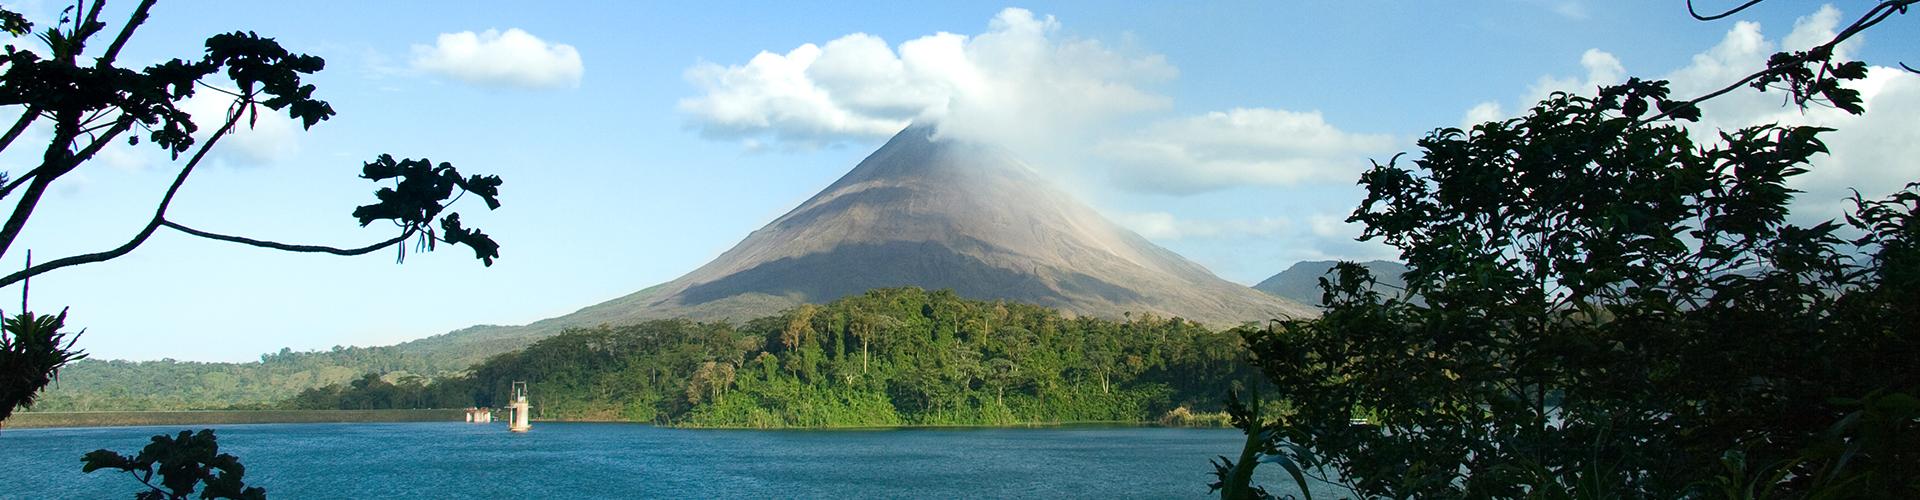 Costa Rica: Sustainability through Renewable Energy